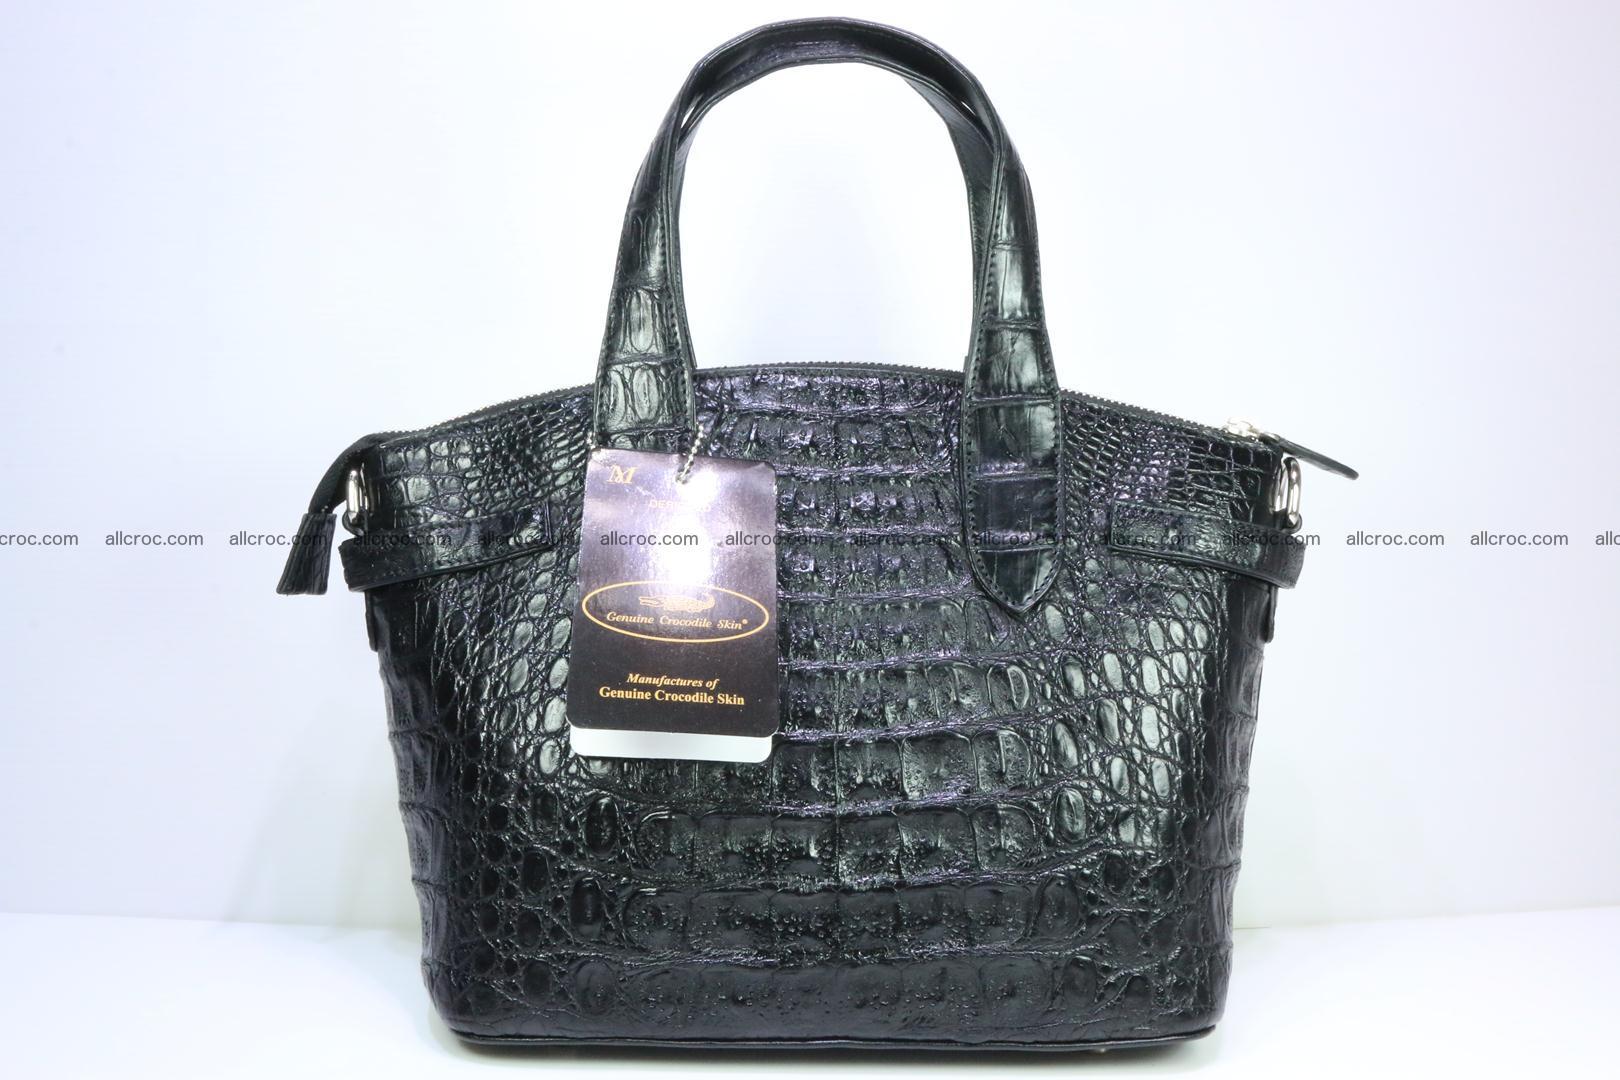 Genuine crocodile handbag for ladies 051 Foto 5